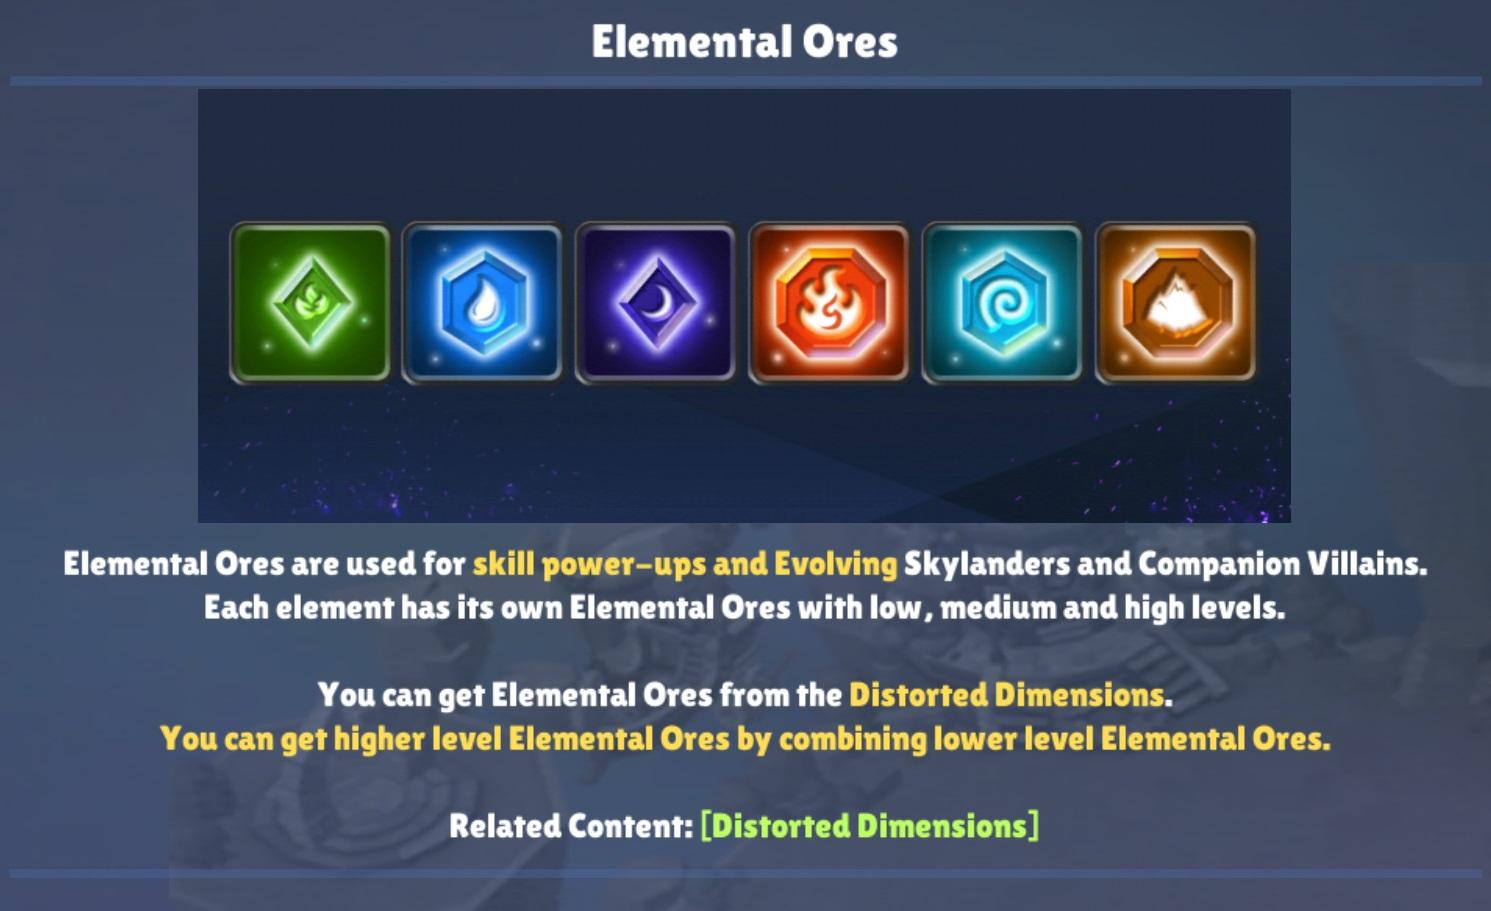 Elemental Ores